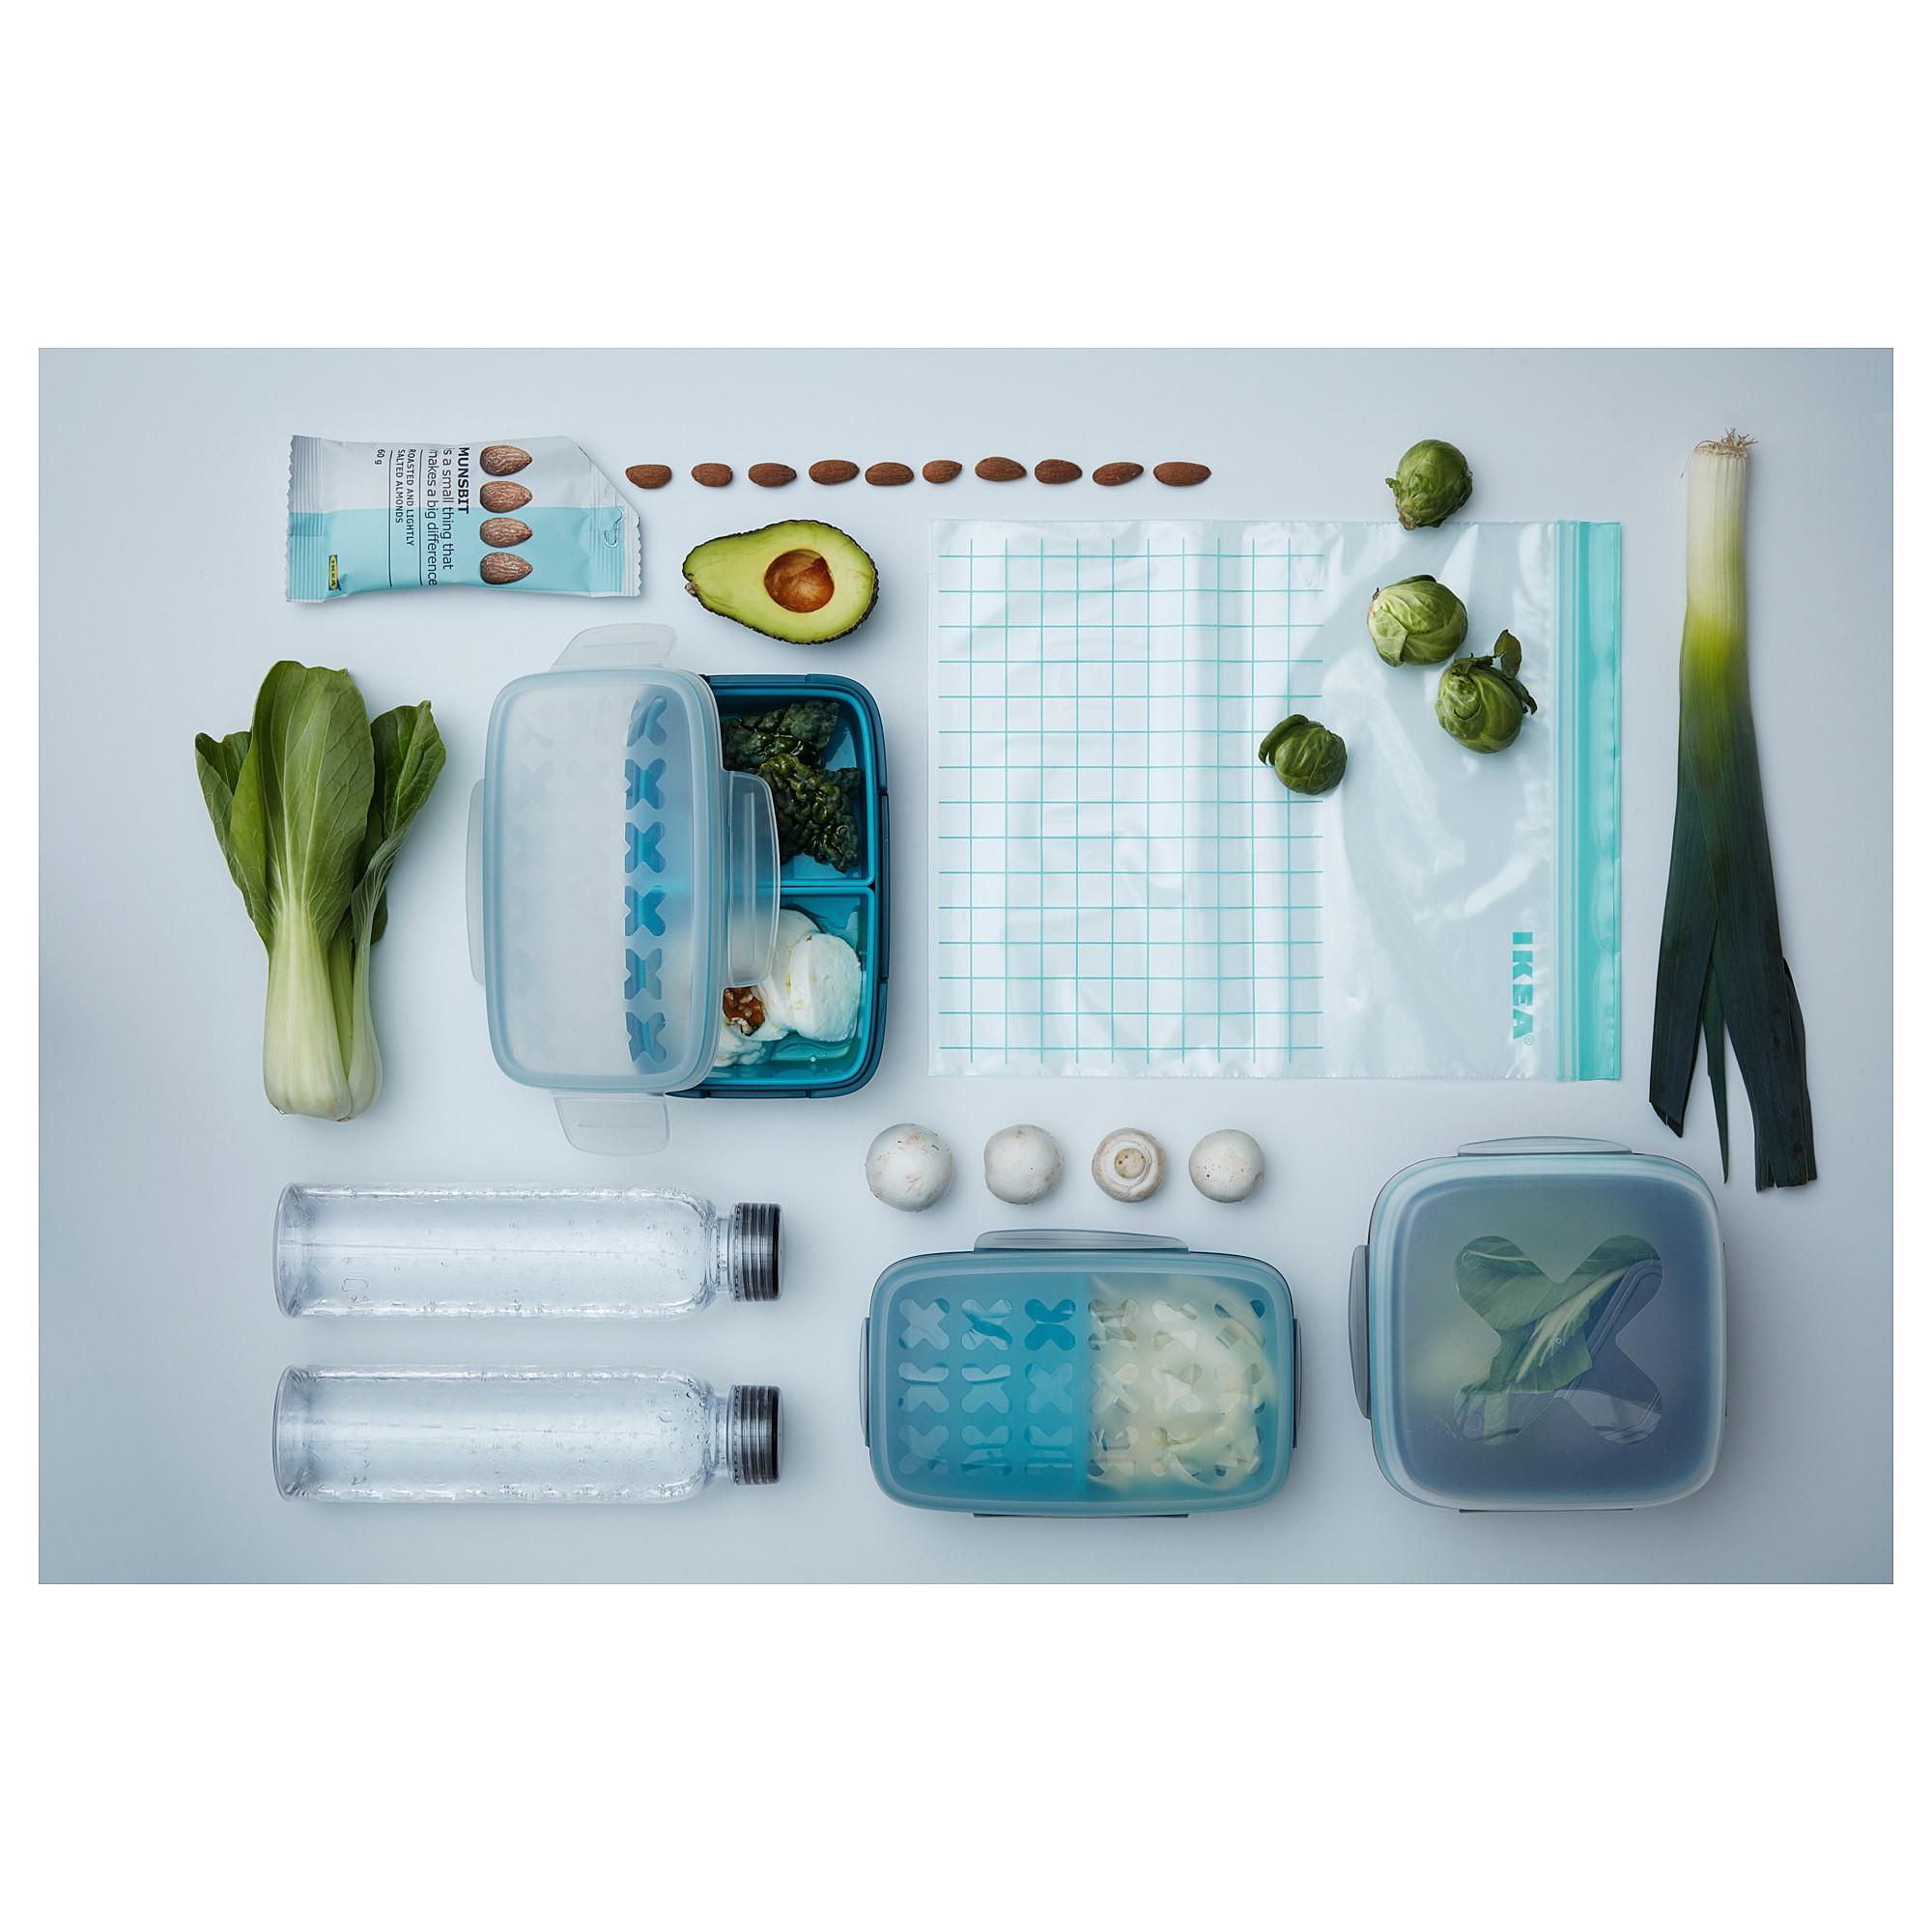 Ikea Plastic Grocery Bag Holder istad Plastic Freezer Bag Ikea